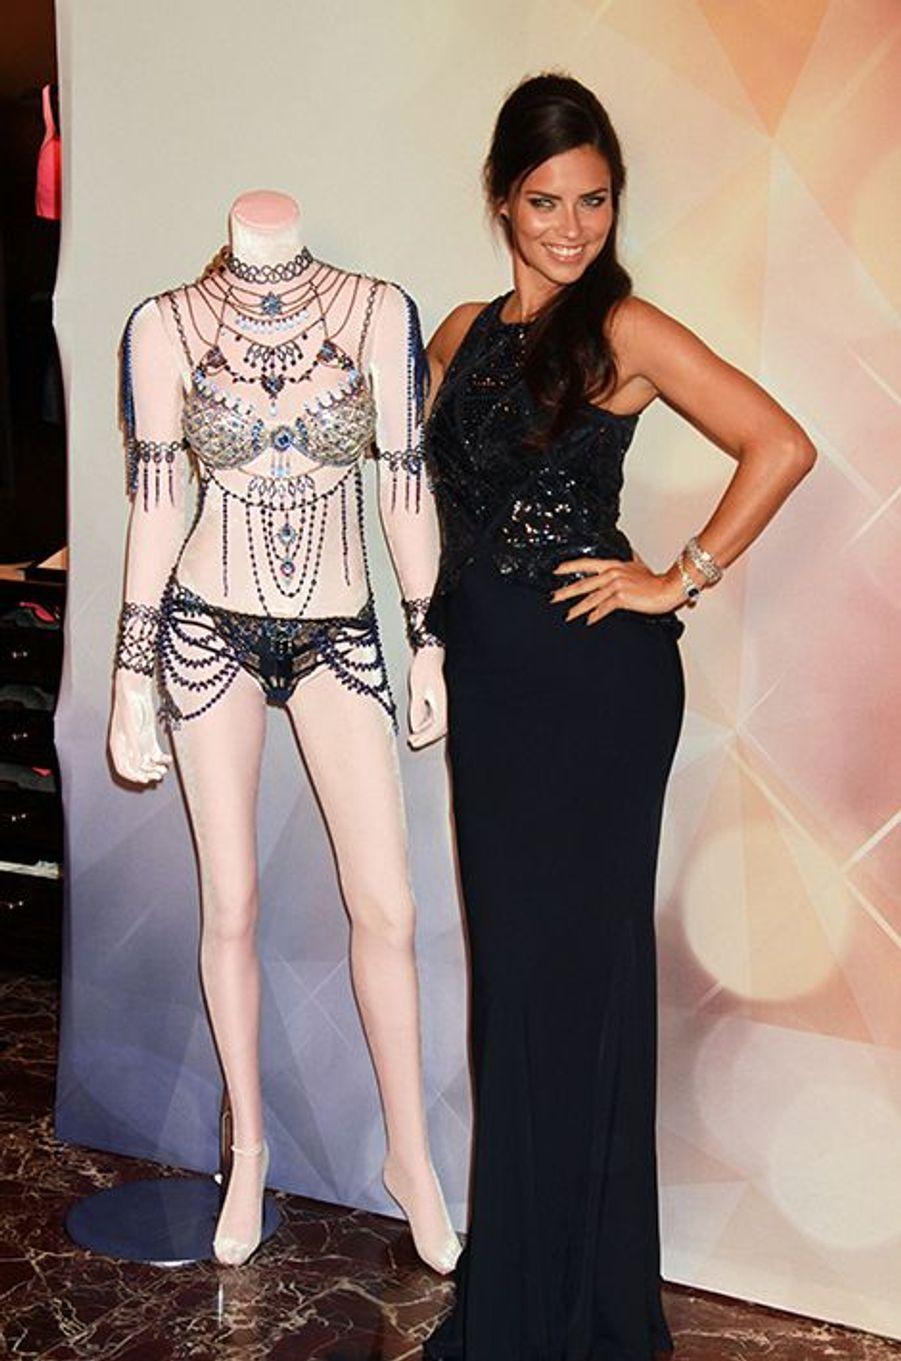 Adriana Lima à Las Vegas le 13 novembre 2014